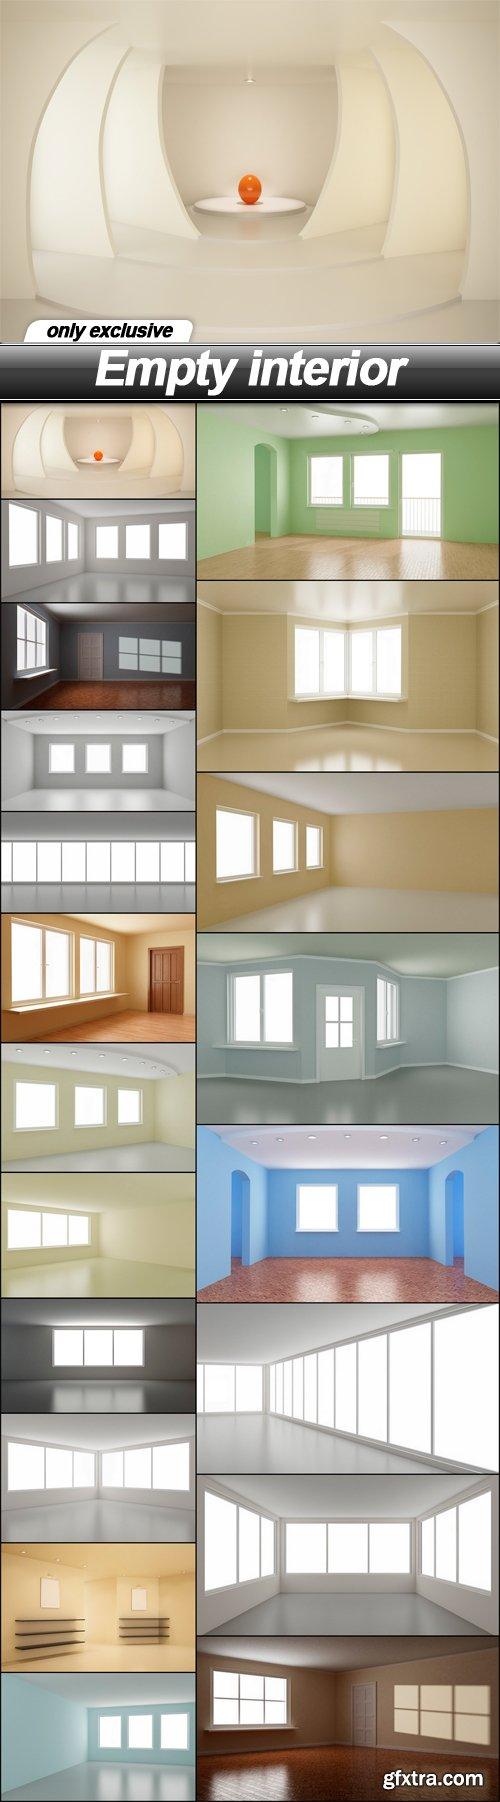 Empty interior - 20 UHQ JPEG